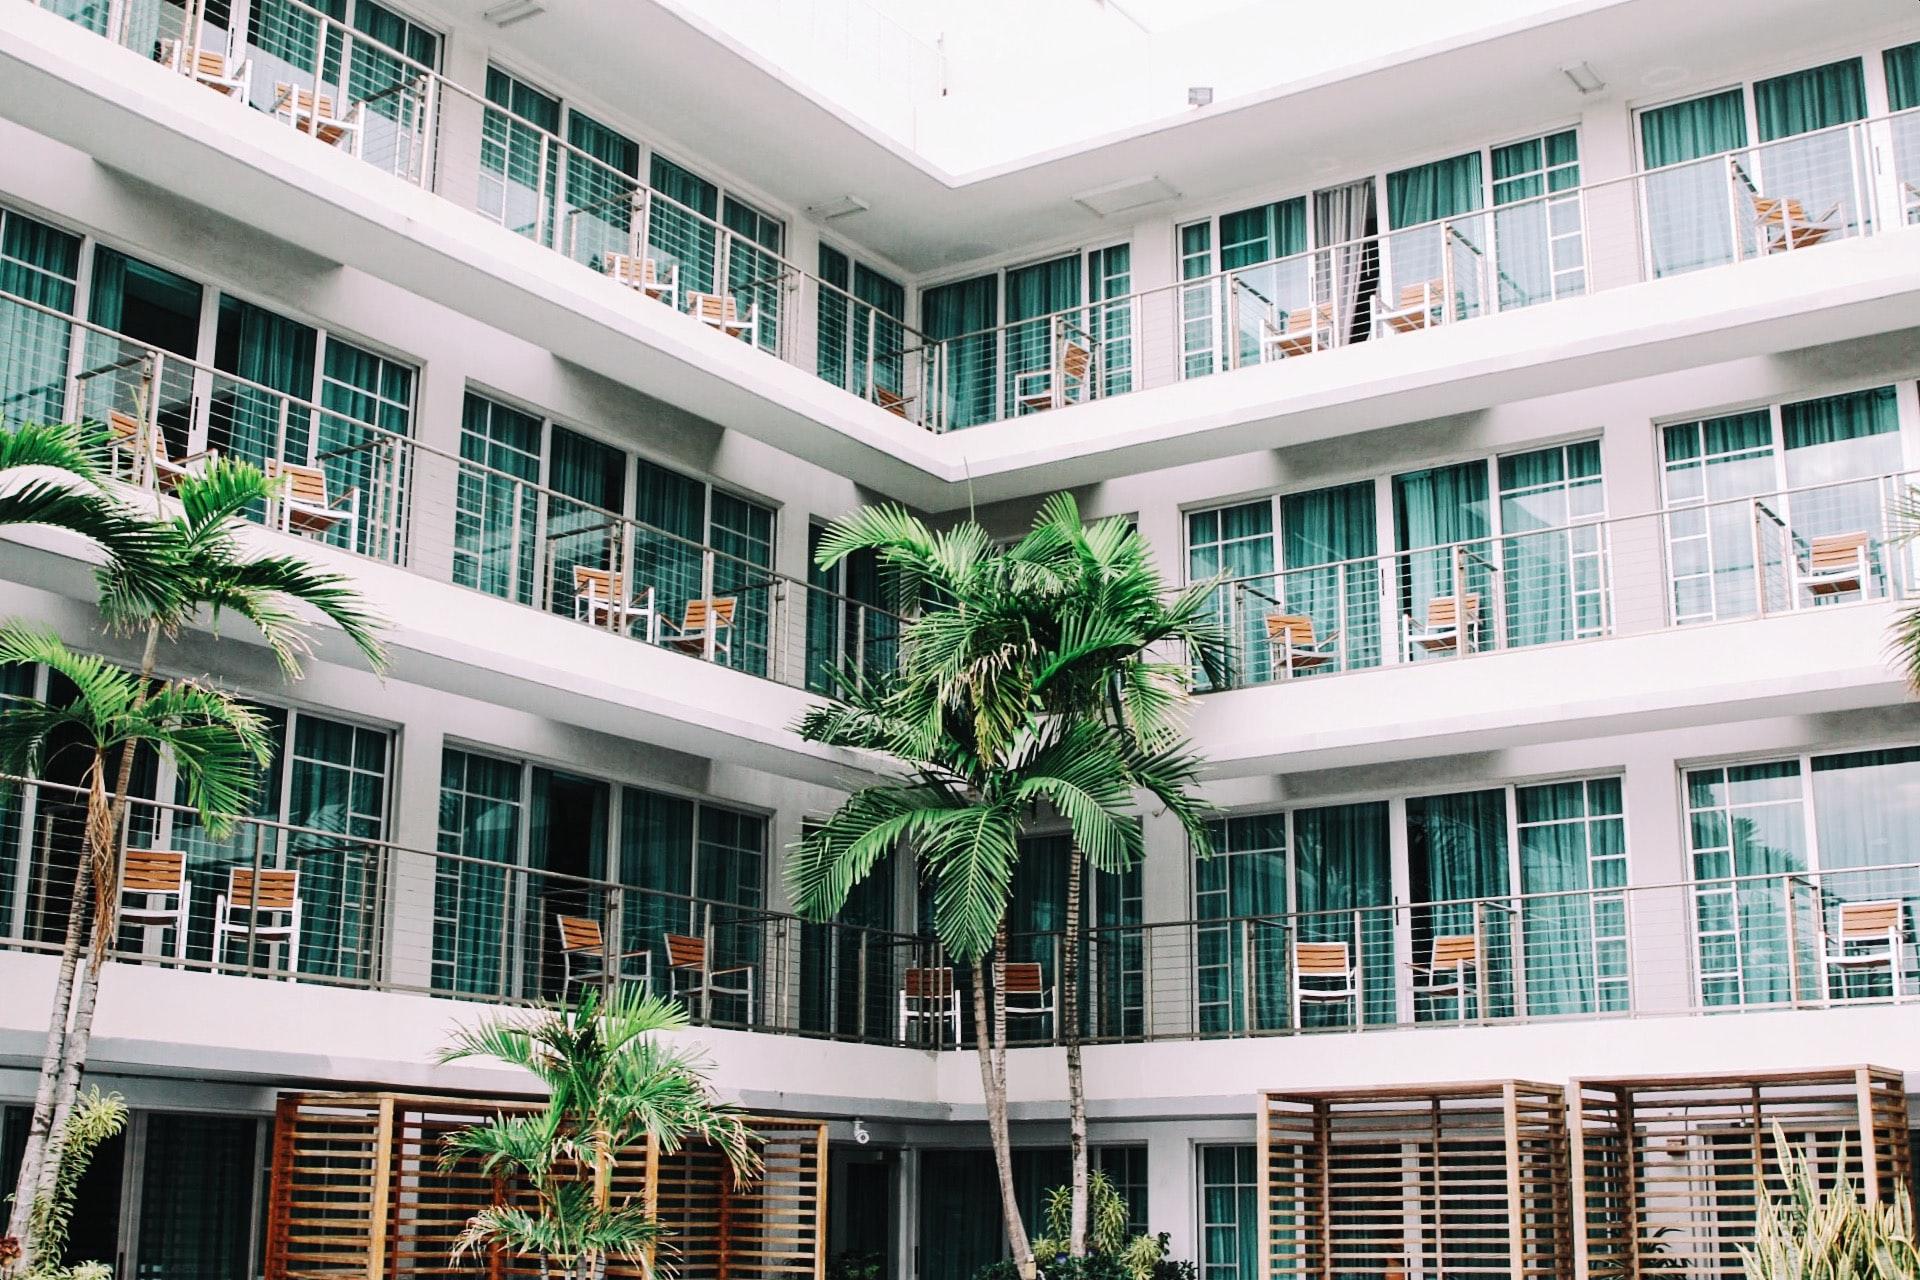 Travel & Hospitality Insights - June 2020